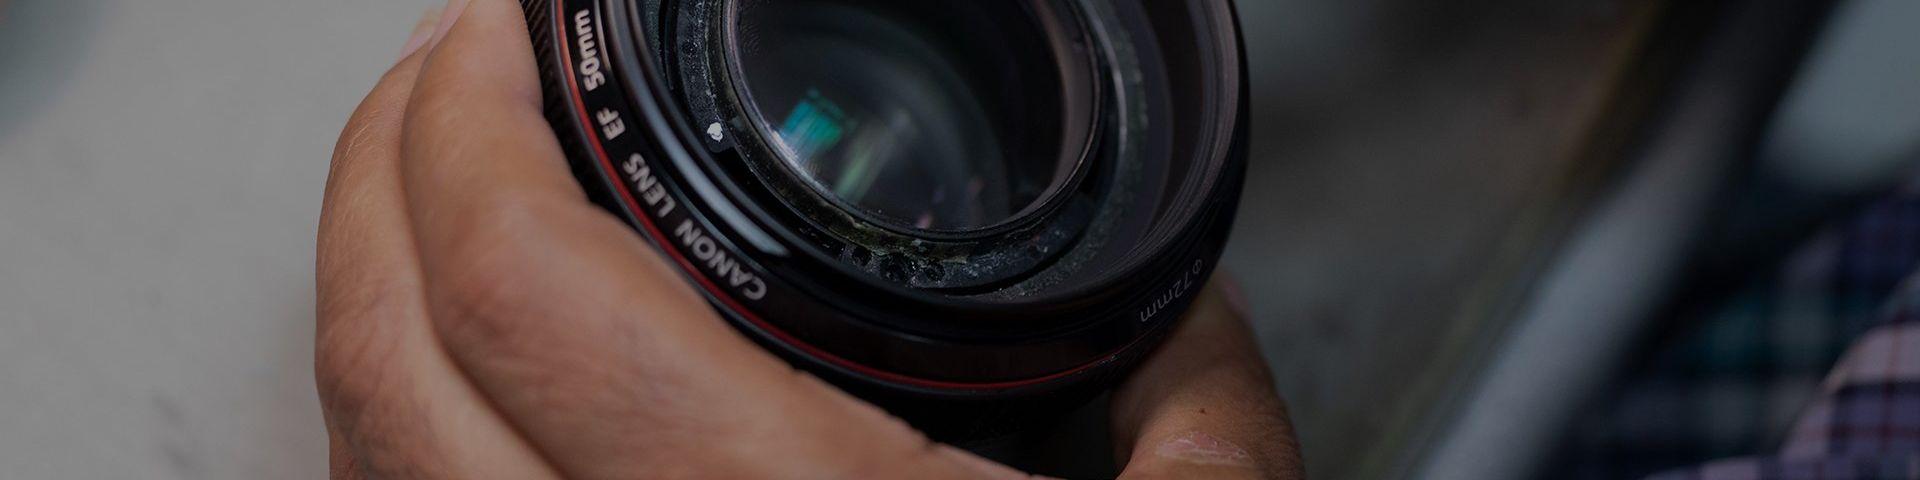 Kameraobjektivpflege Service   Canon Deutschland